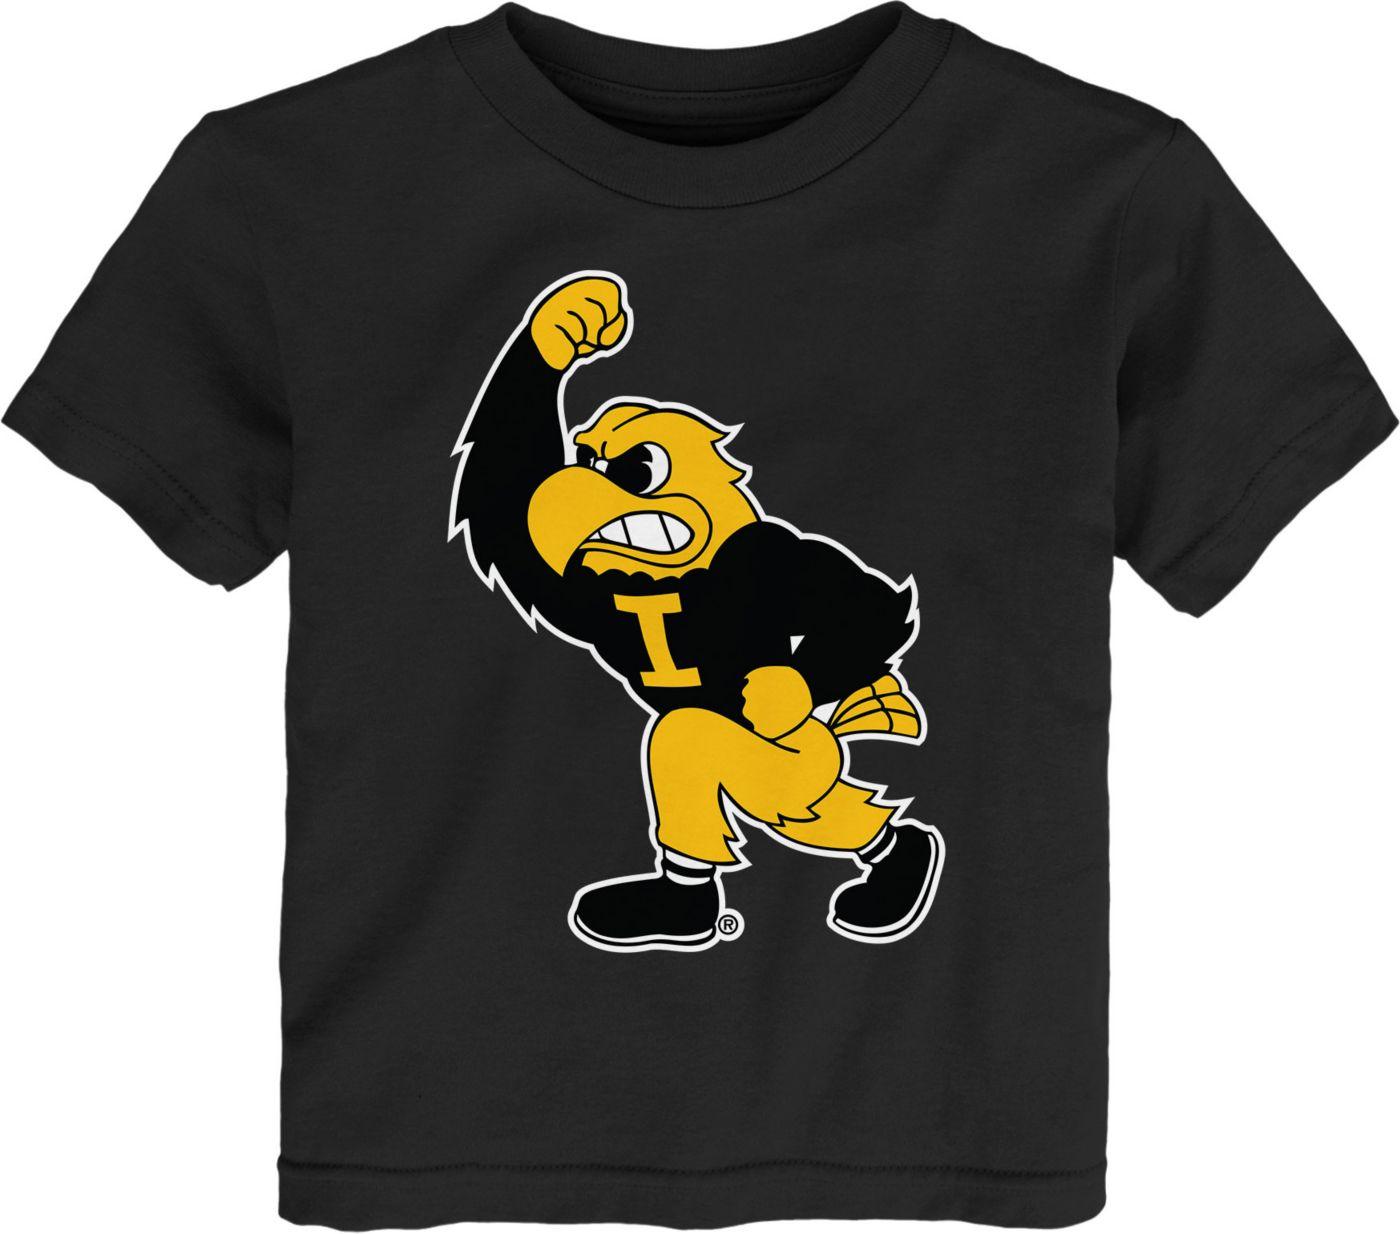 Gen2 Toddler Iowa Hawkeyes Standing Mascot Black T-Shirt